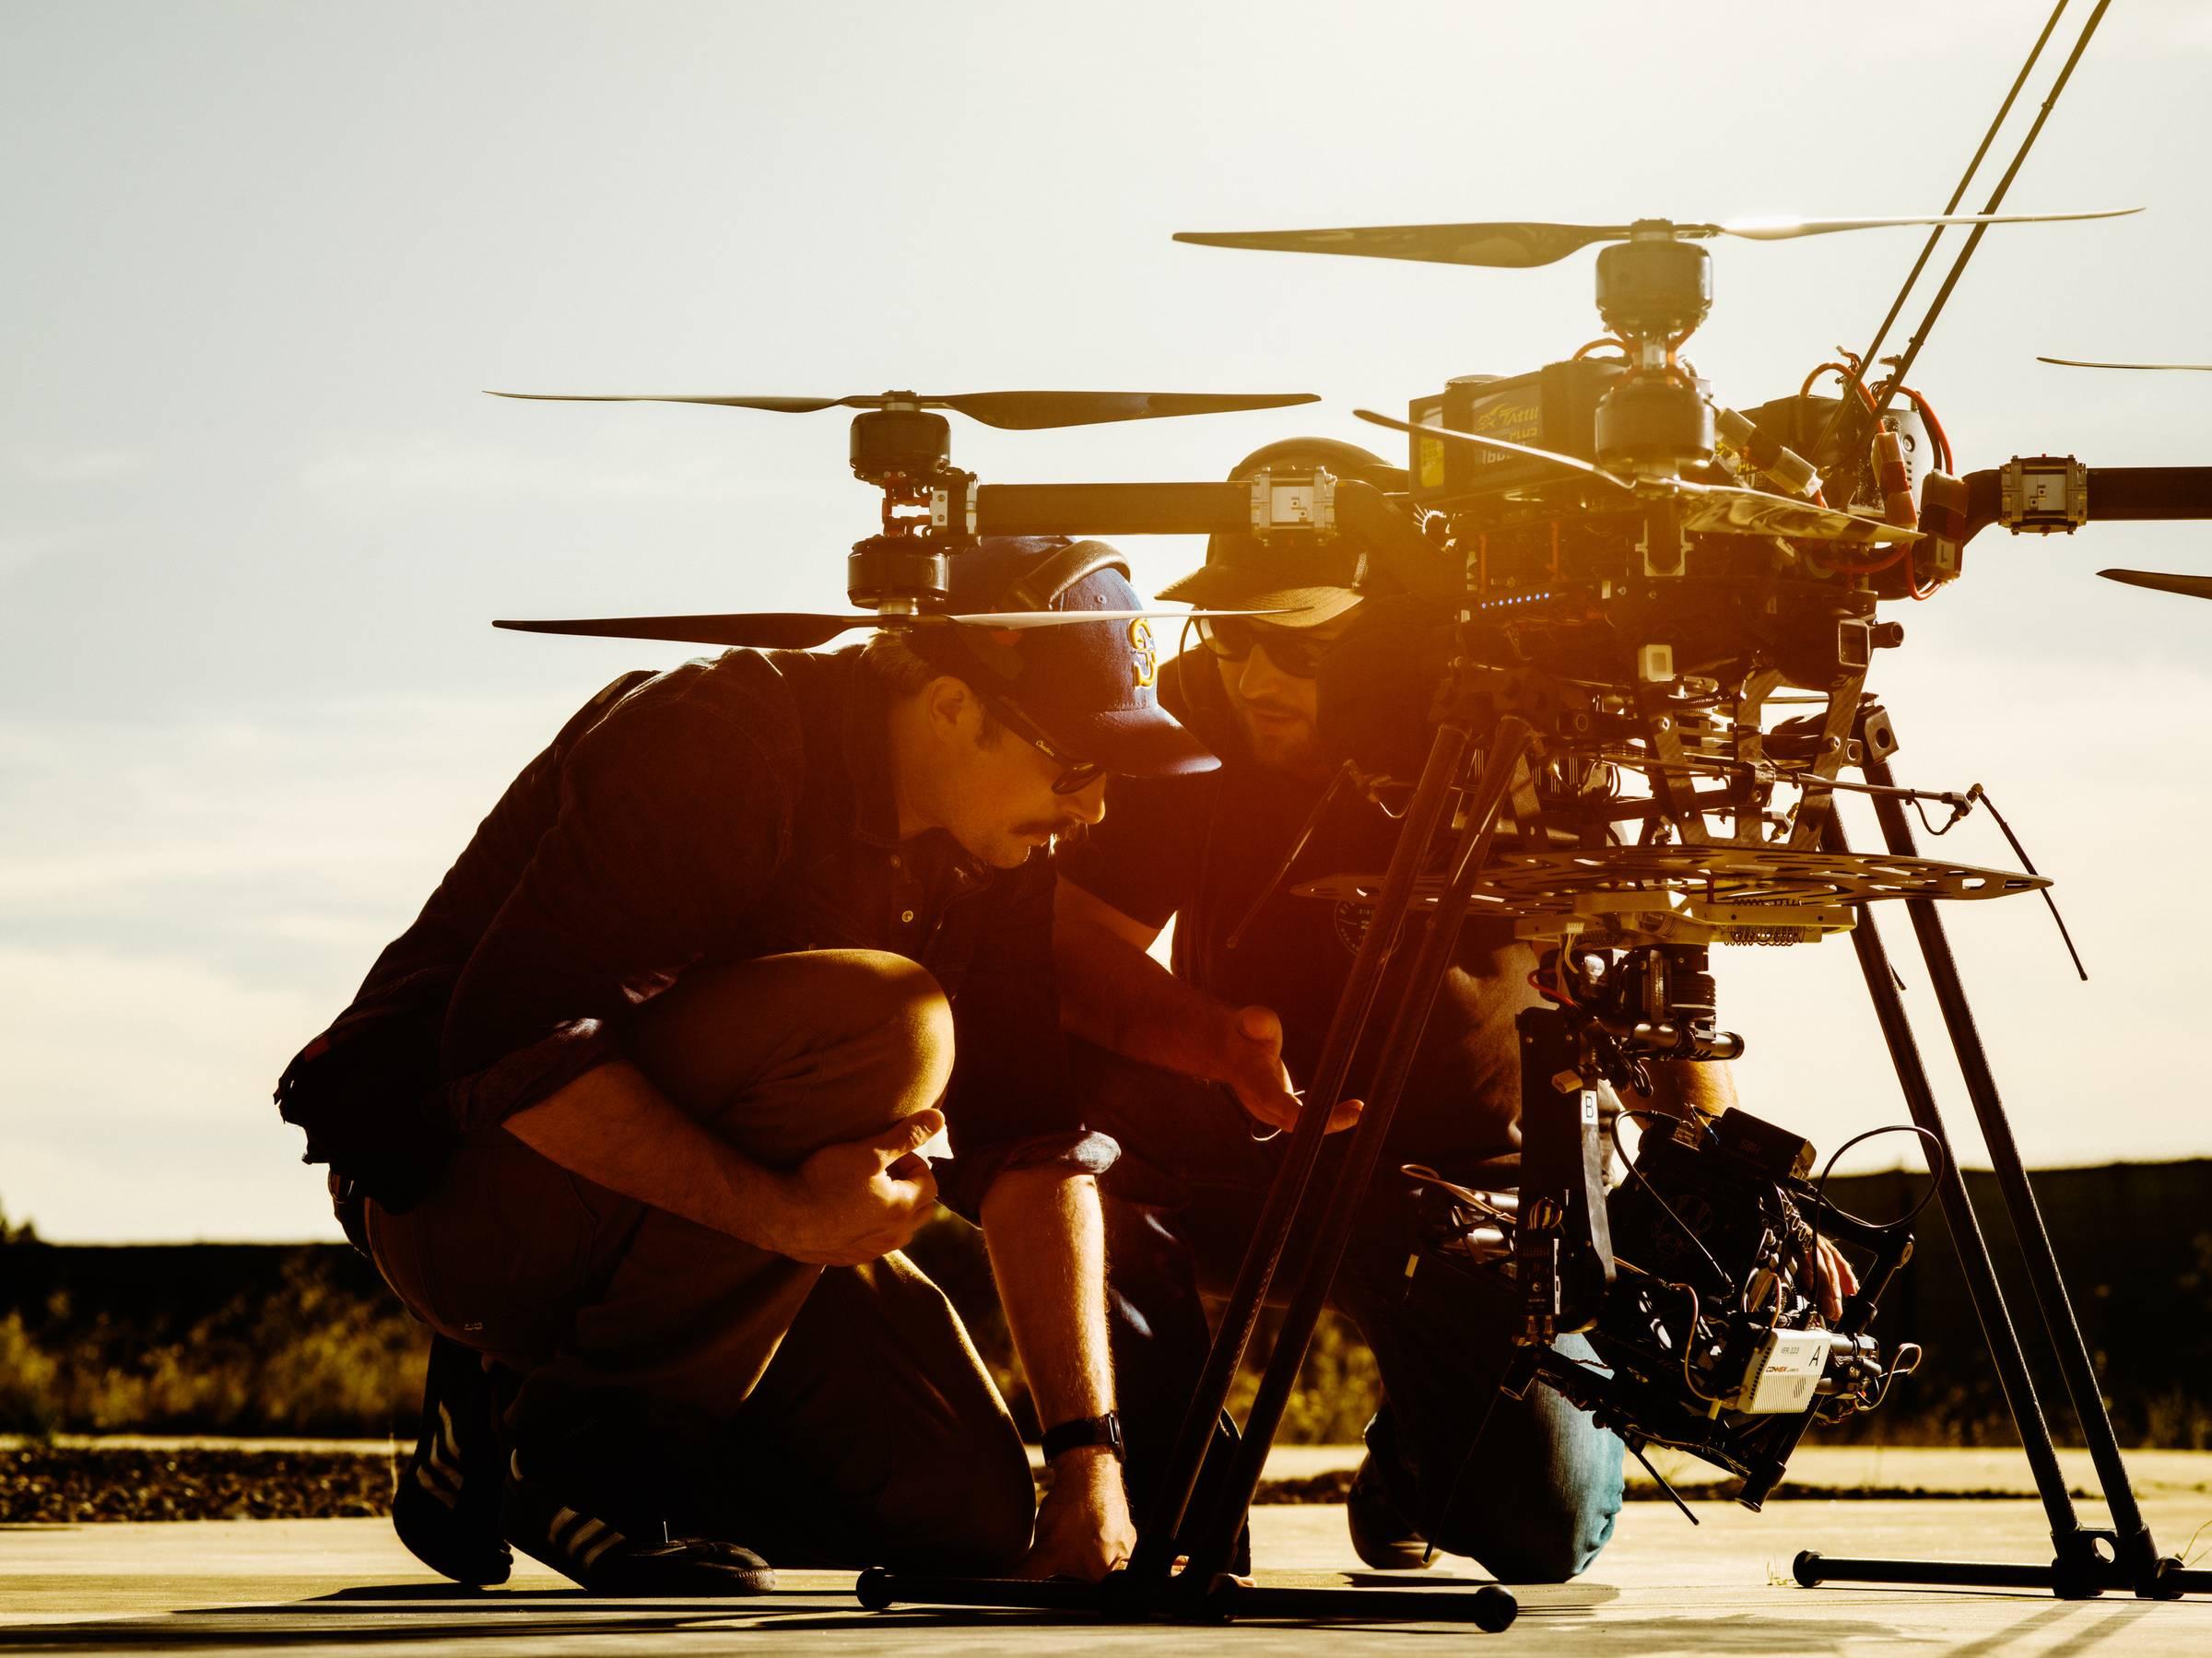 astraeusaerialcinemasystems-cinema-drone-timecover-timejakestangel.jpeg